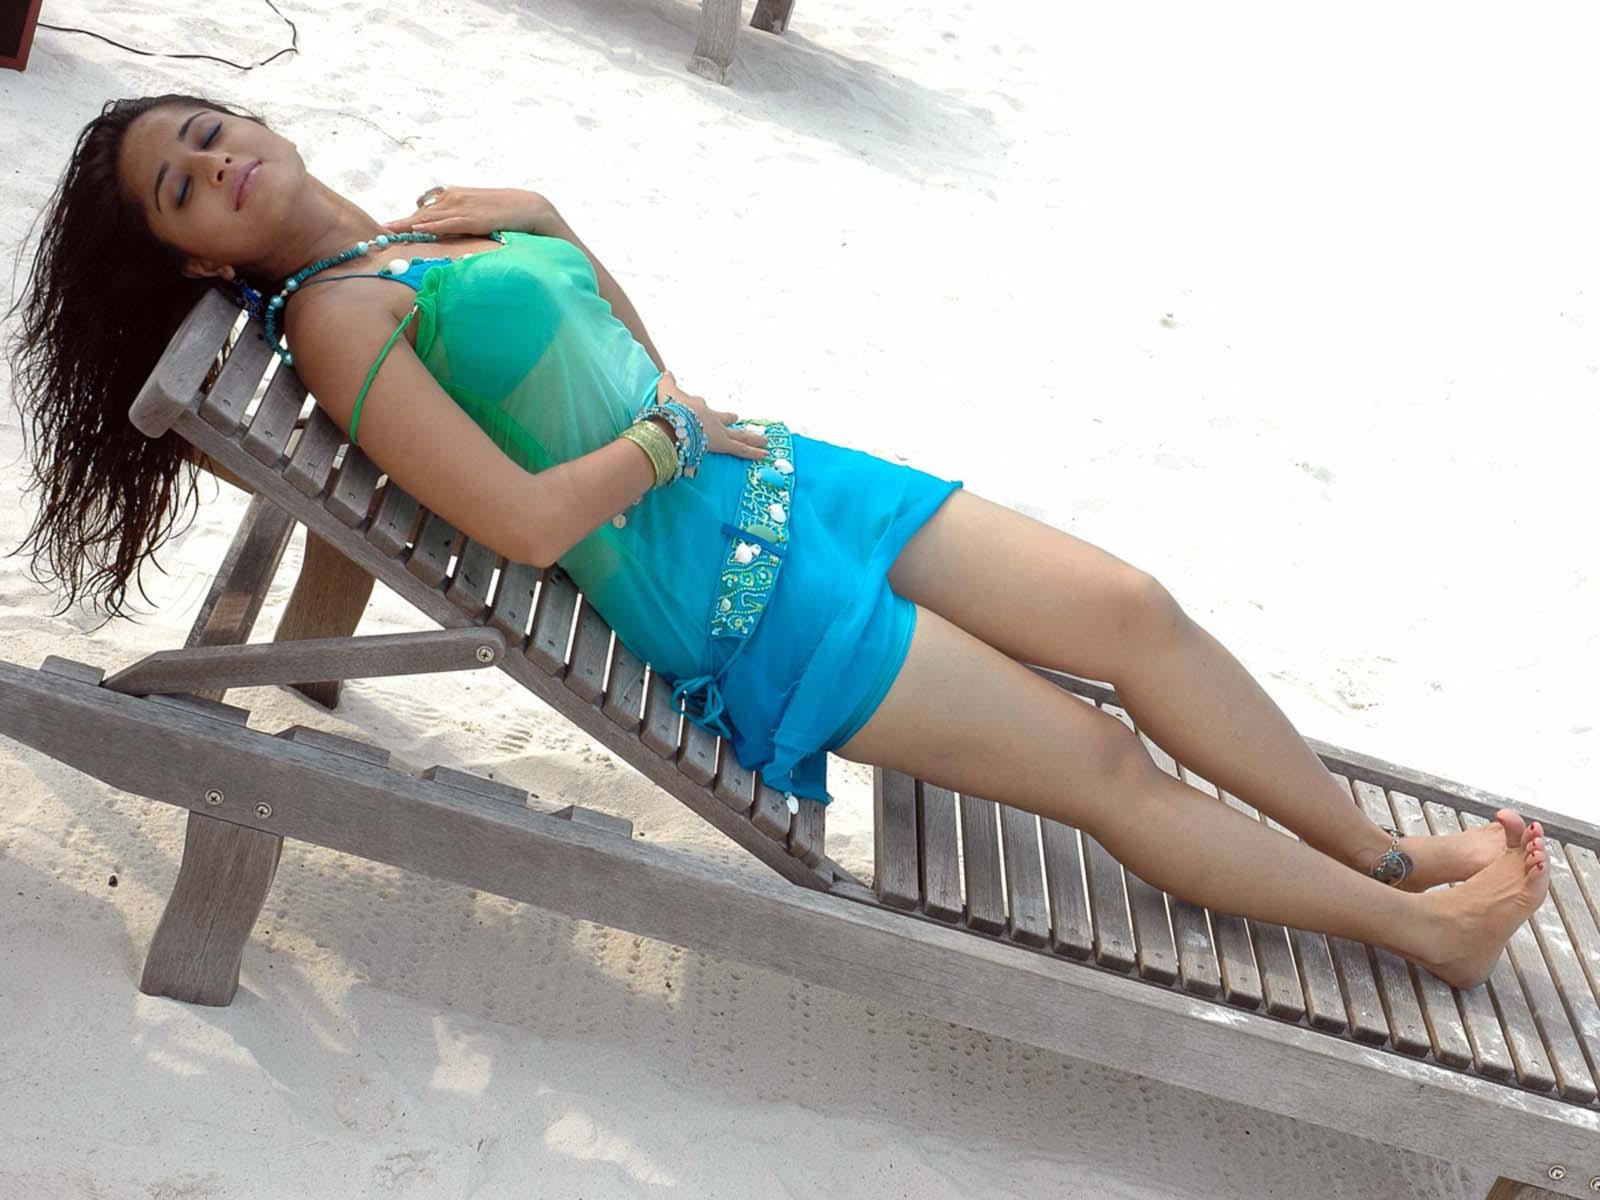 Bikini in anushka shetty sleeping, moms tan lines